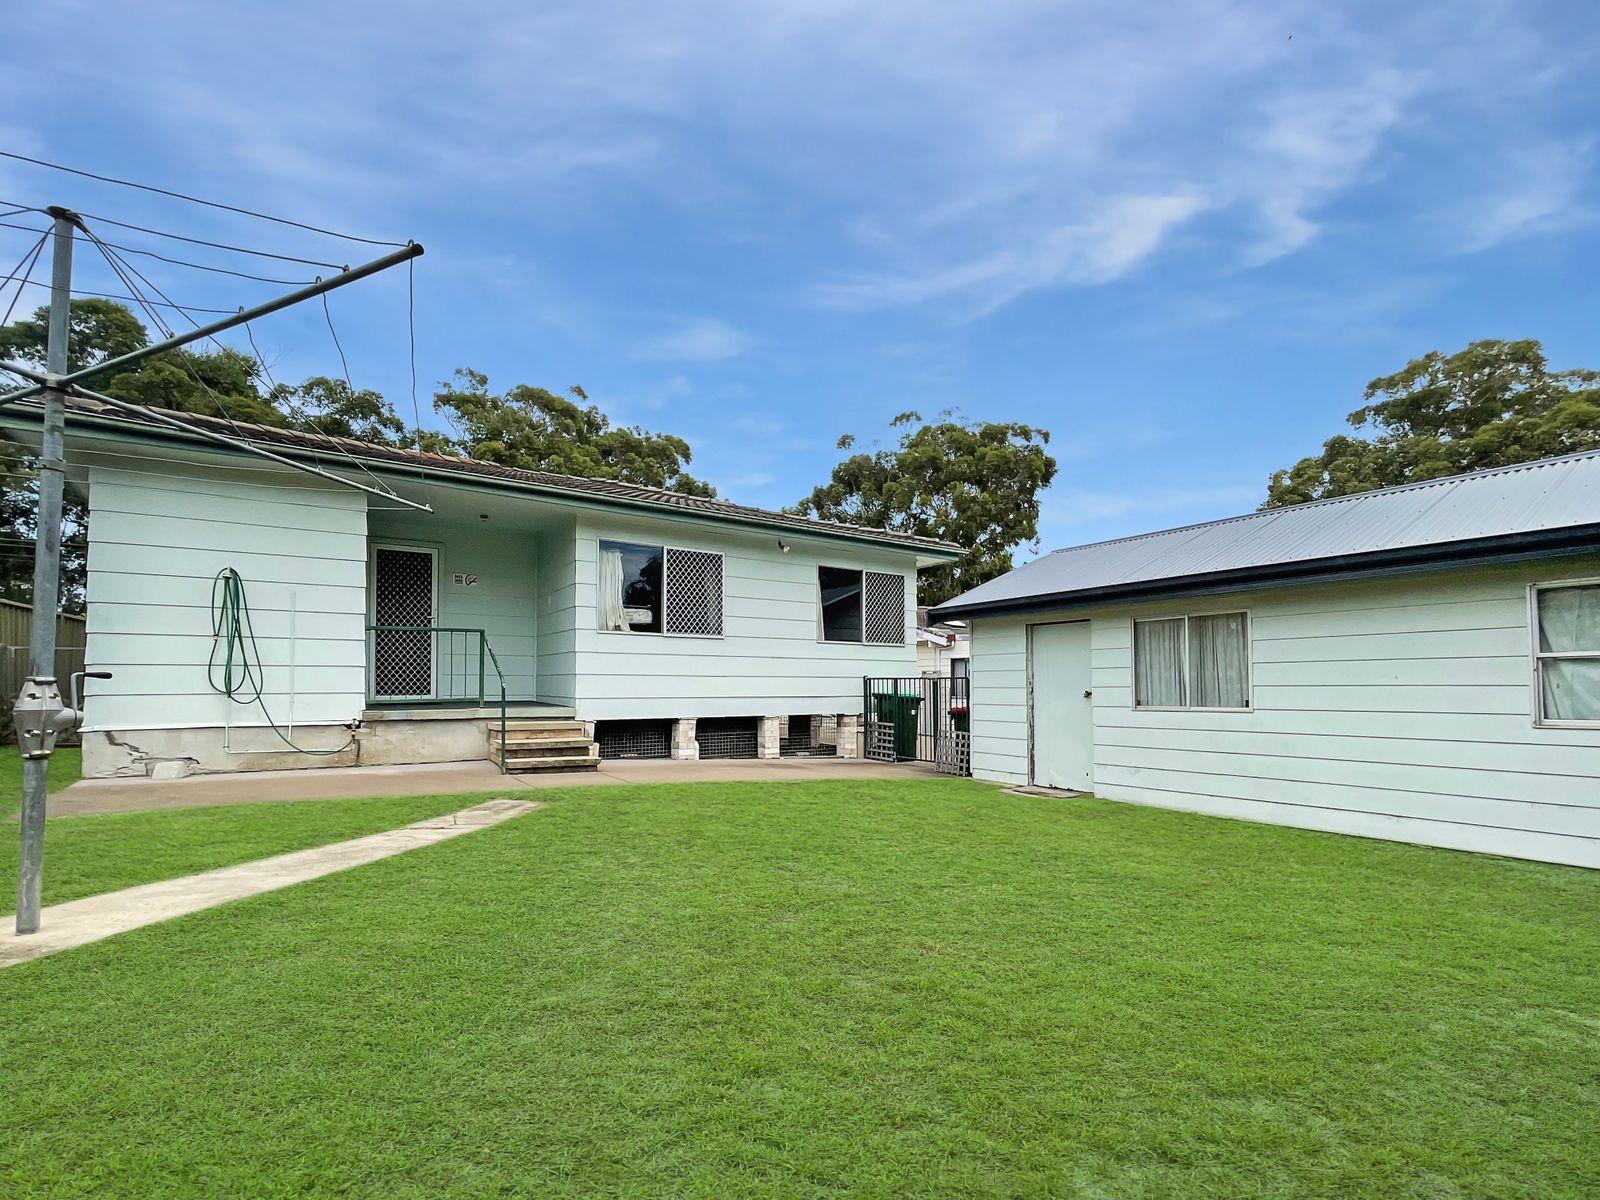 31 Binda Street, Hawks Nest, NSW 2324